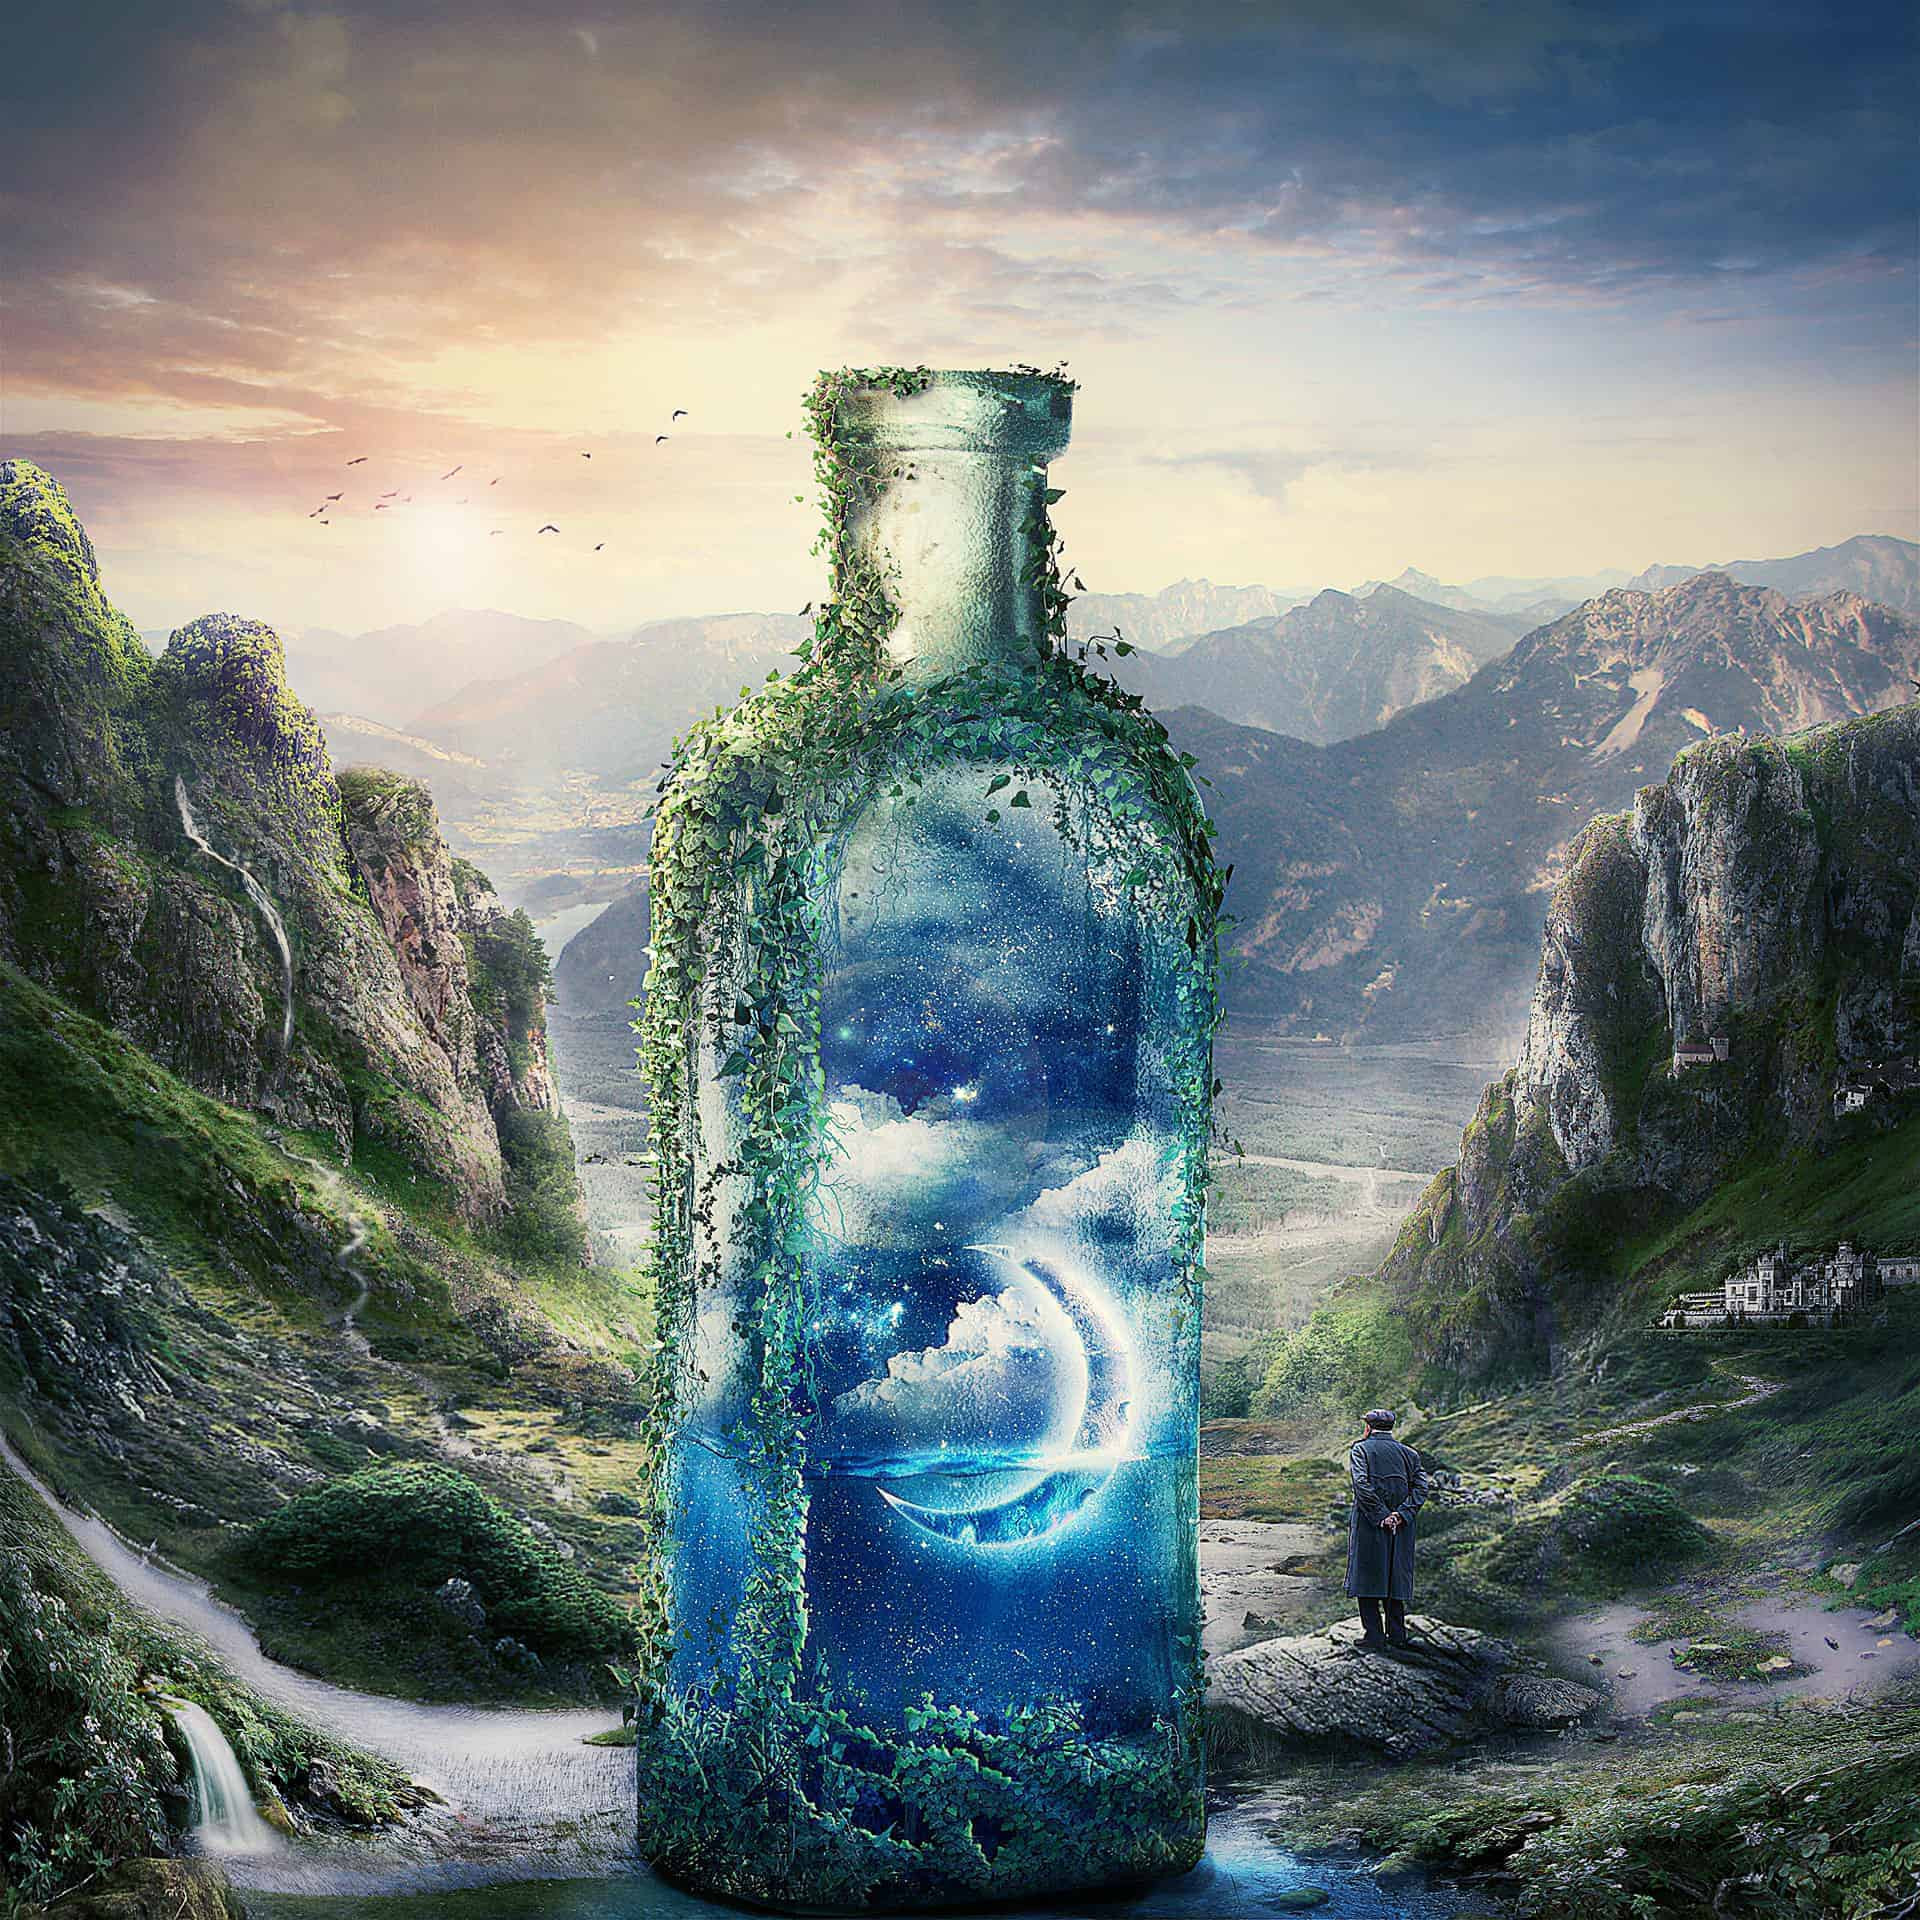 Create A Surreal And Magical Dream Bottle Landscape Photoshop Tutorials